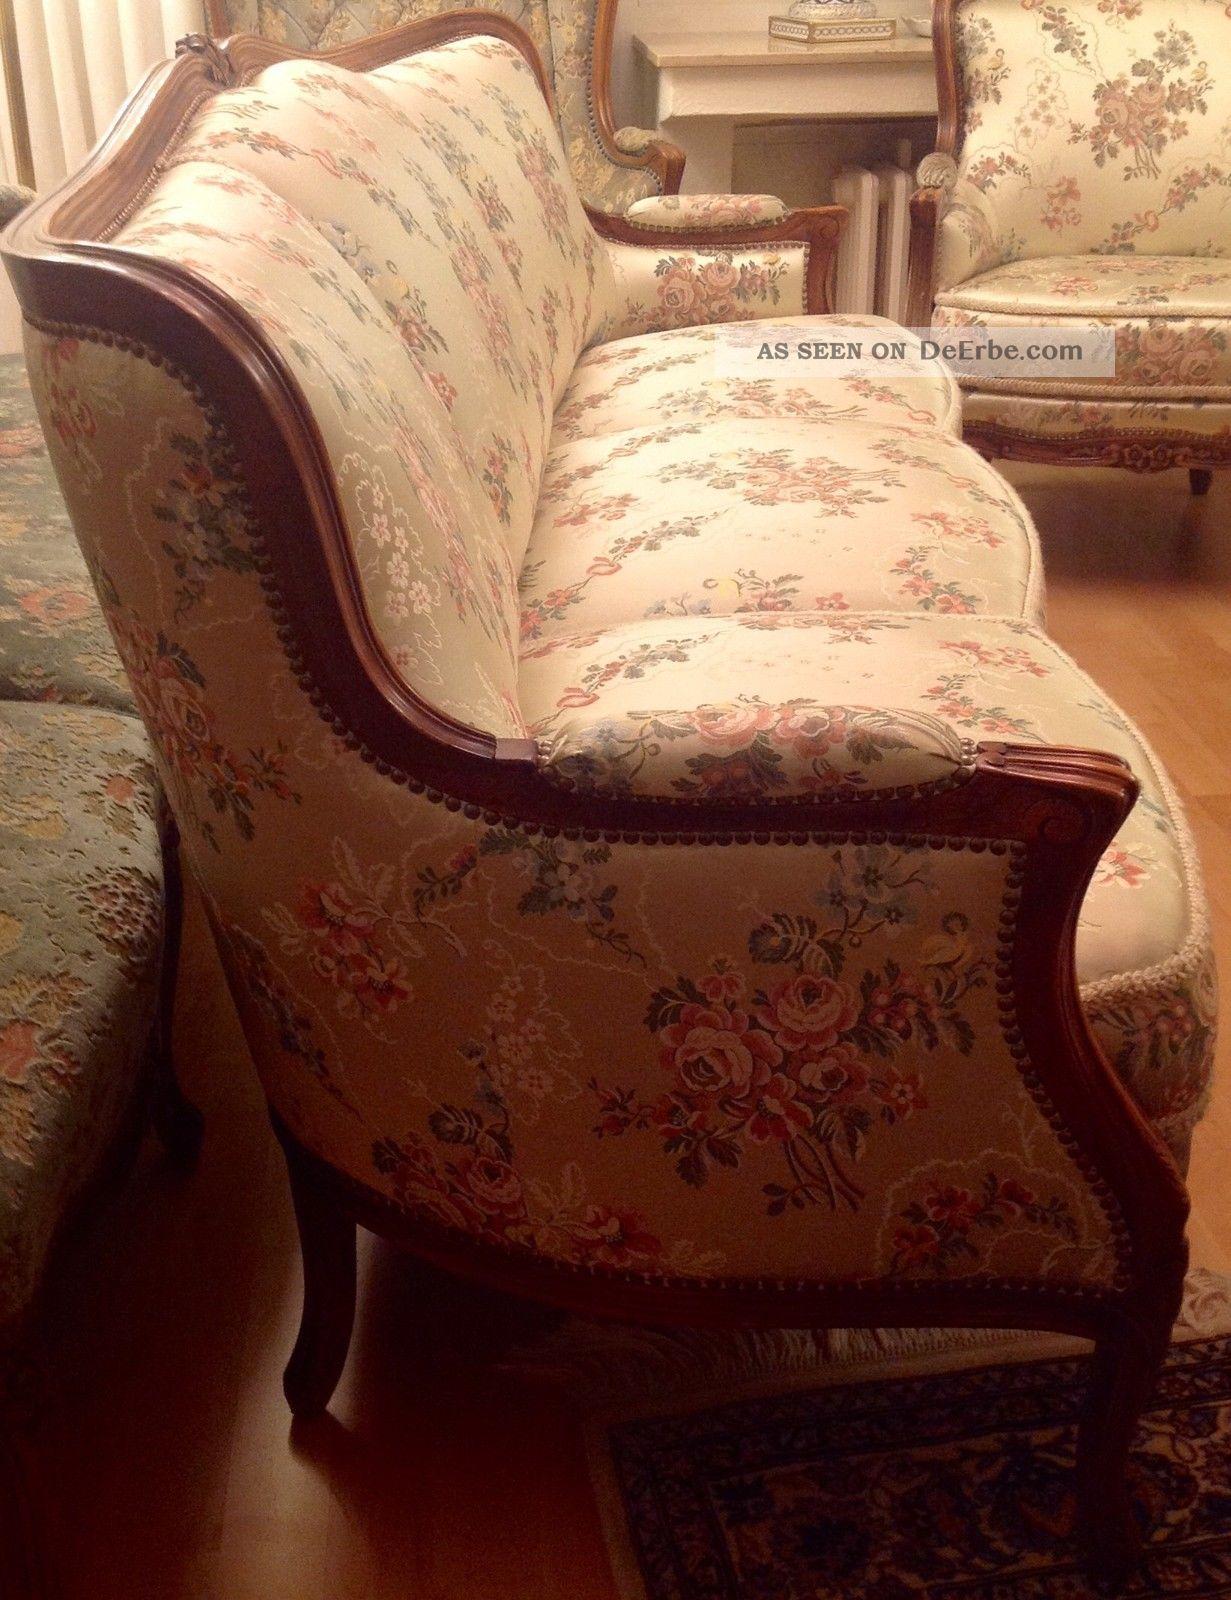 1 sofa dreisitzer und 2 sessel im stil des barock rokoko chippendale chintz. Black Bedroom Furniture Sets. Home Design Ideas